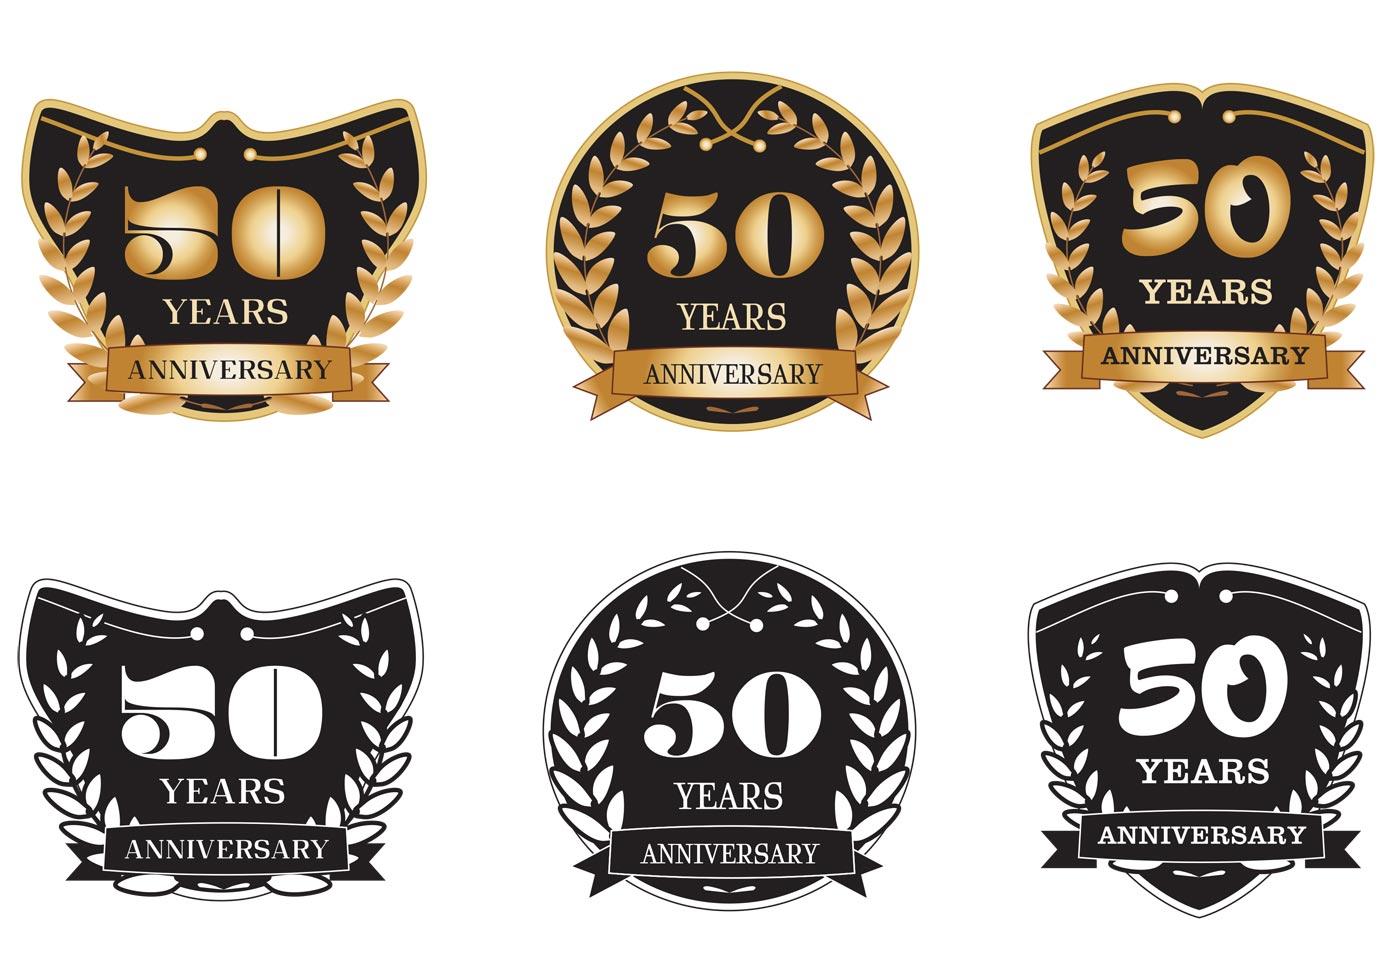 50 Years Anniversary Badges Download Free Vector Art